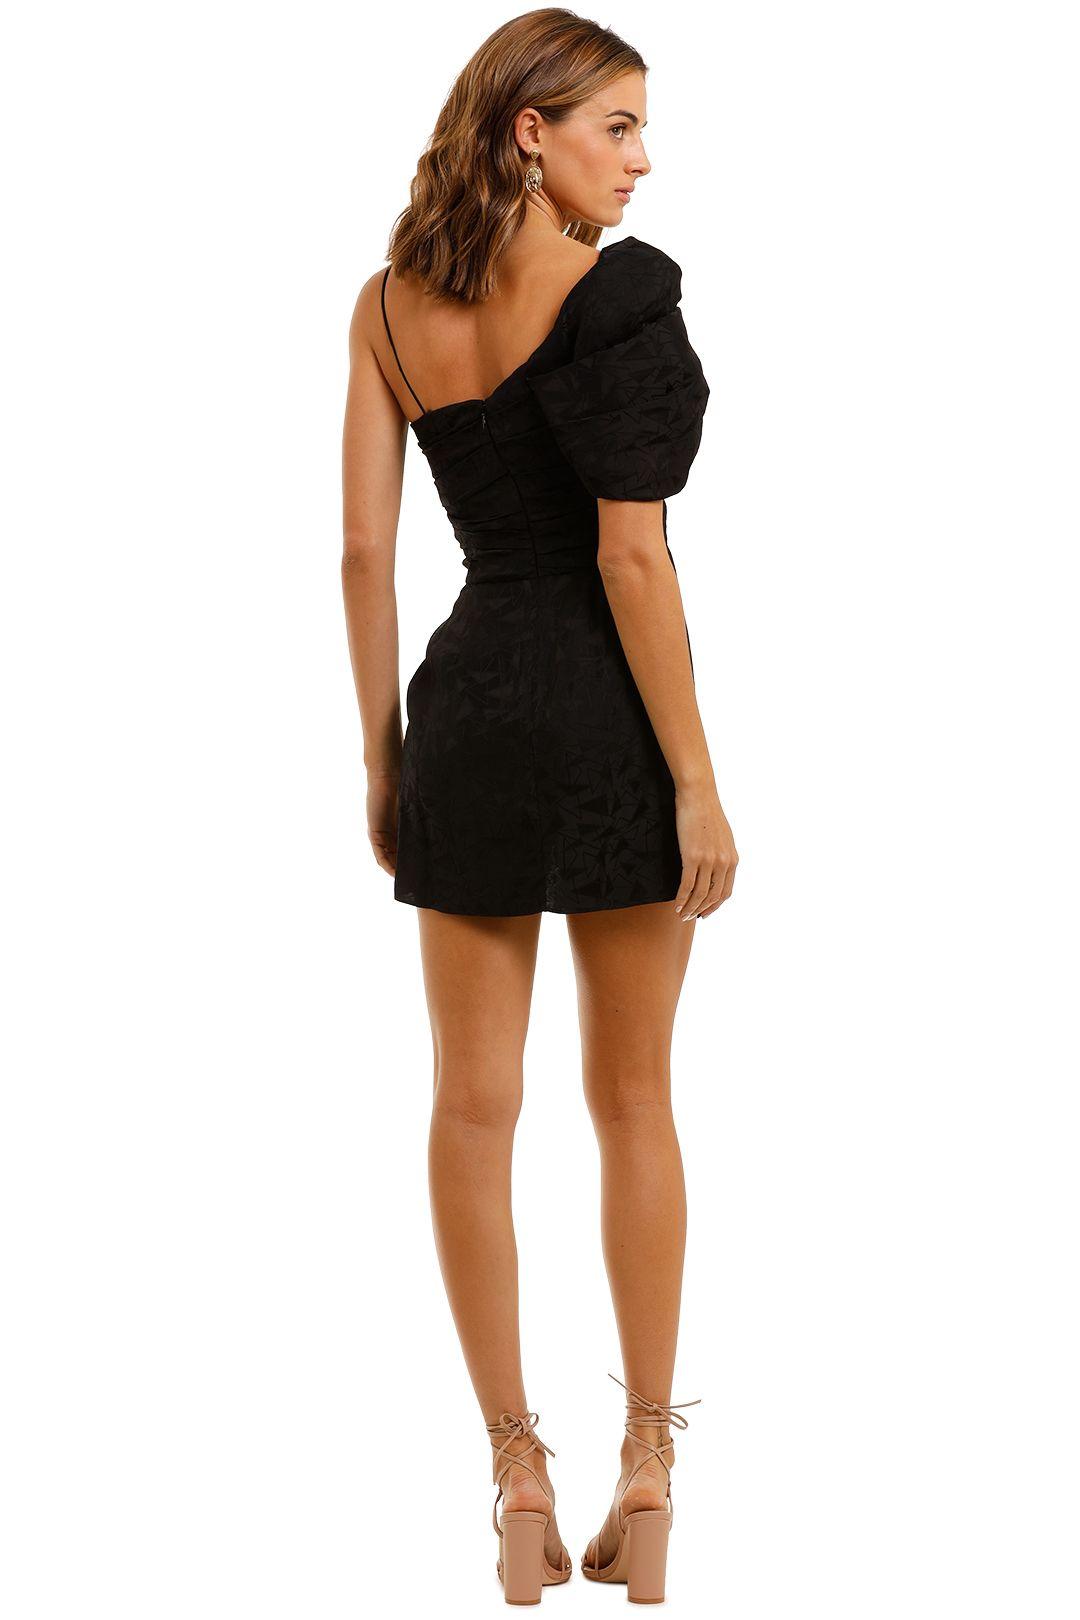 Isabel Marant Vetrae Mini Dress one shoulder